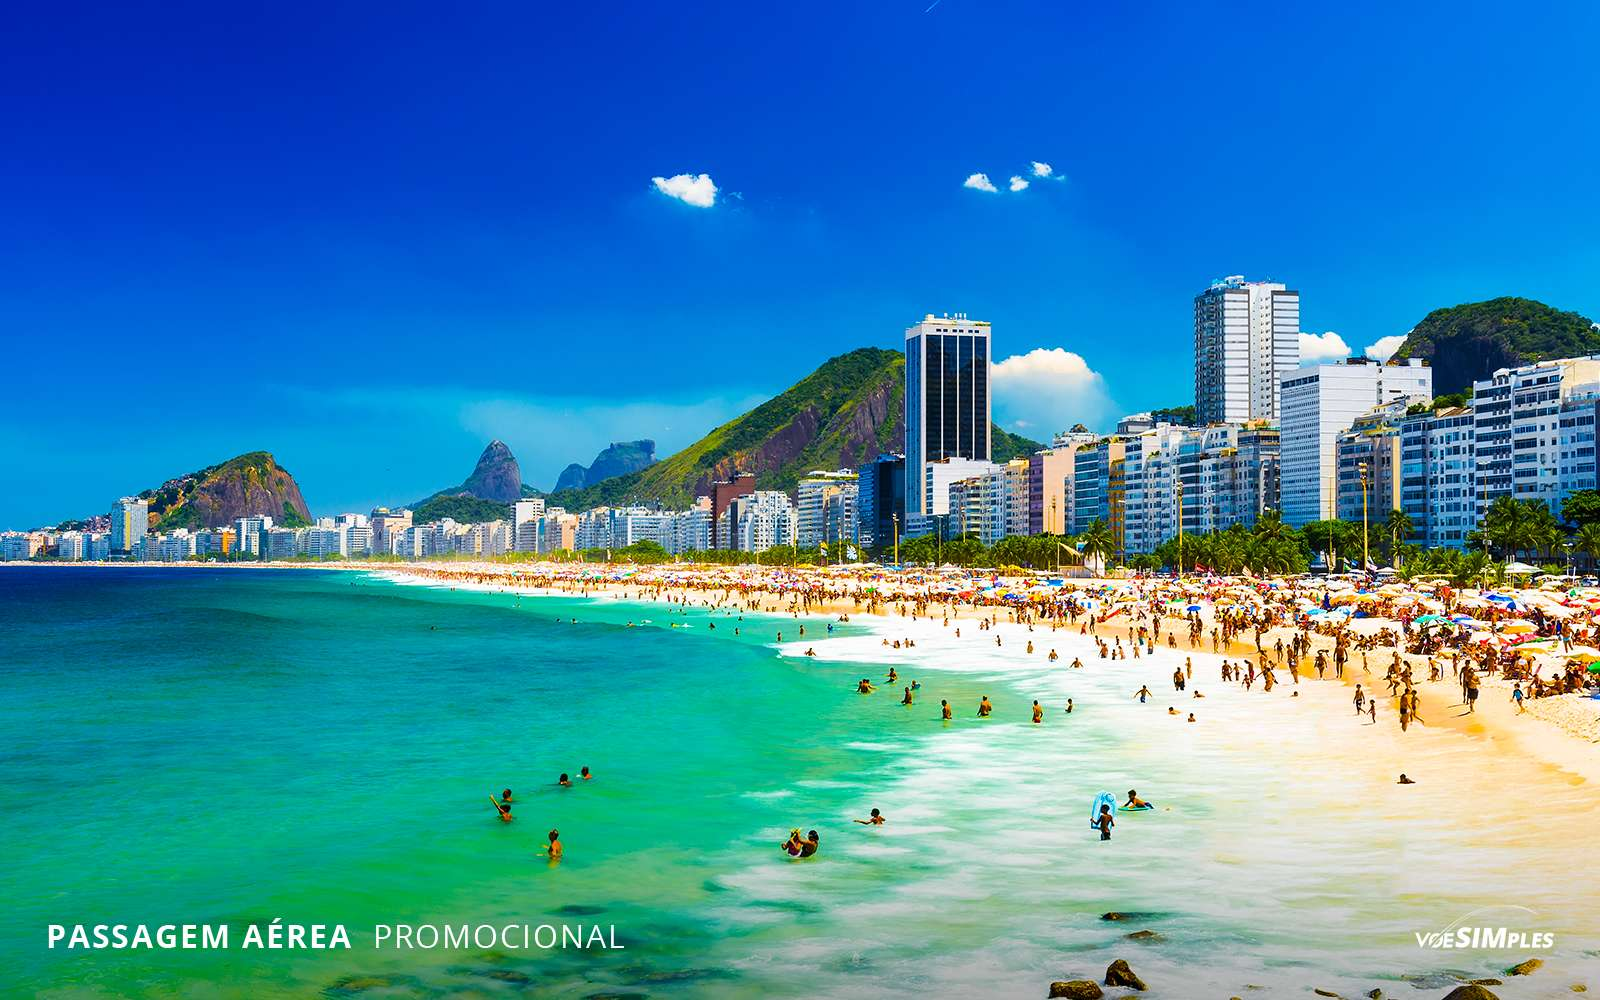 passagem-aerea-promocional-gol-porto-alegre-rio-janeiro-brasil-america-sul-voe-simples-01